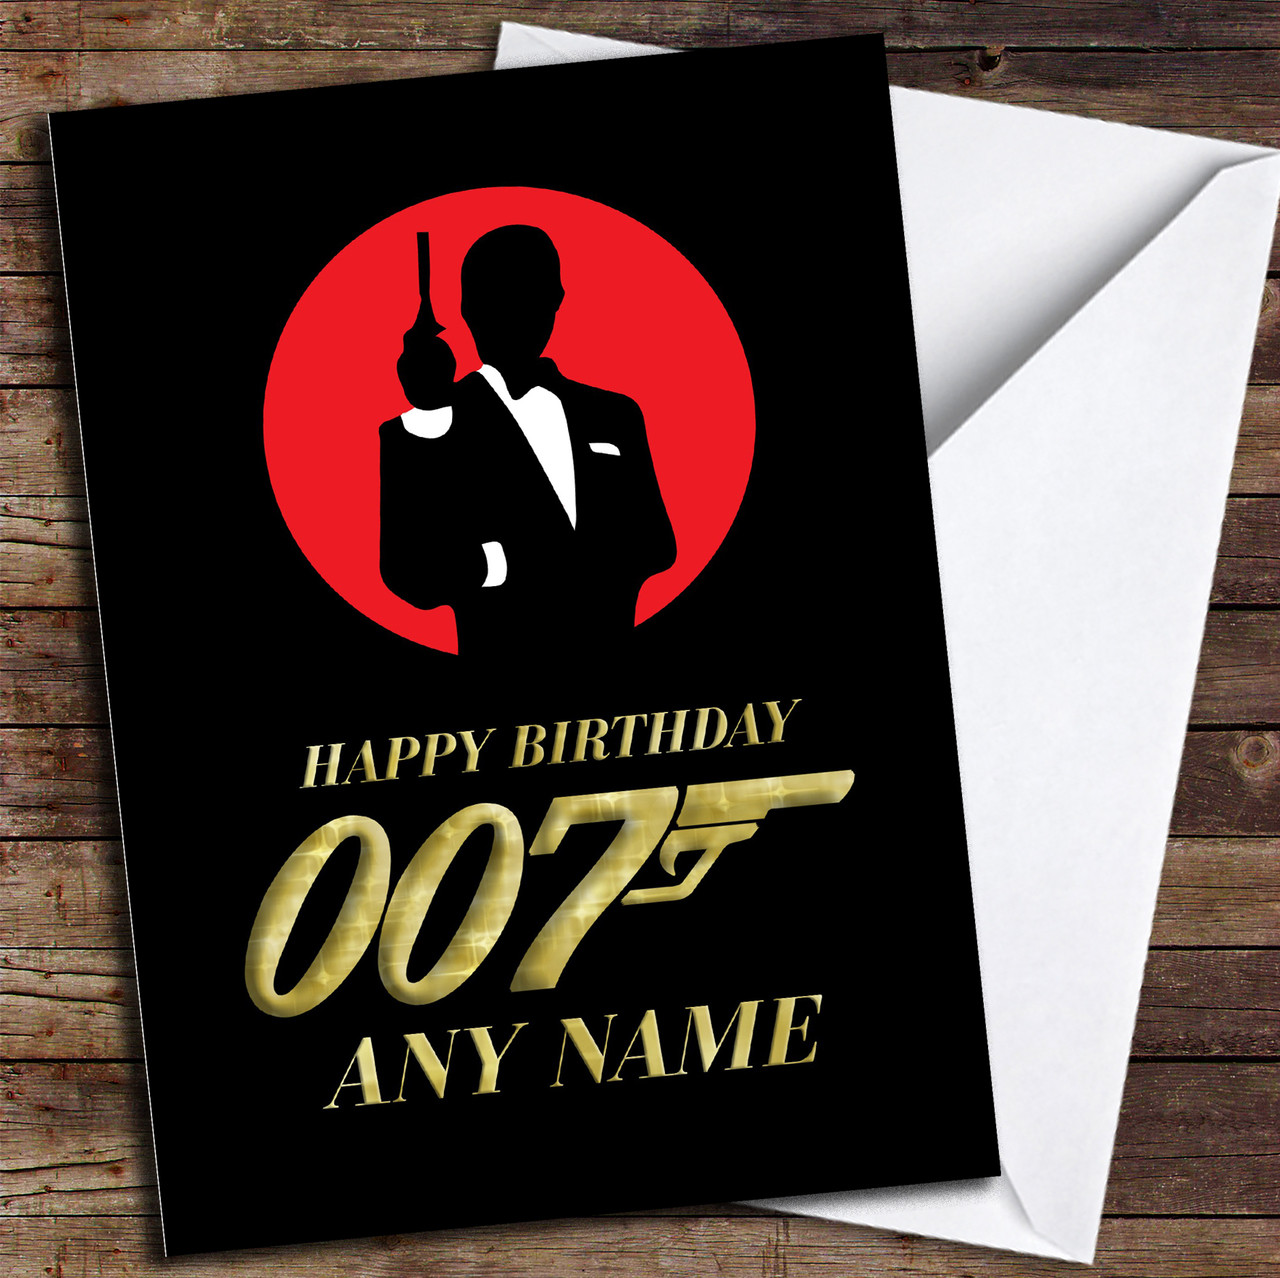 James Bond 007 Gold Personalised Birthday Card